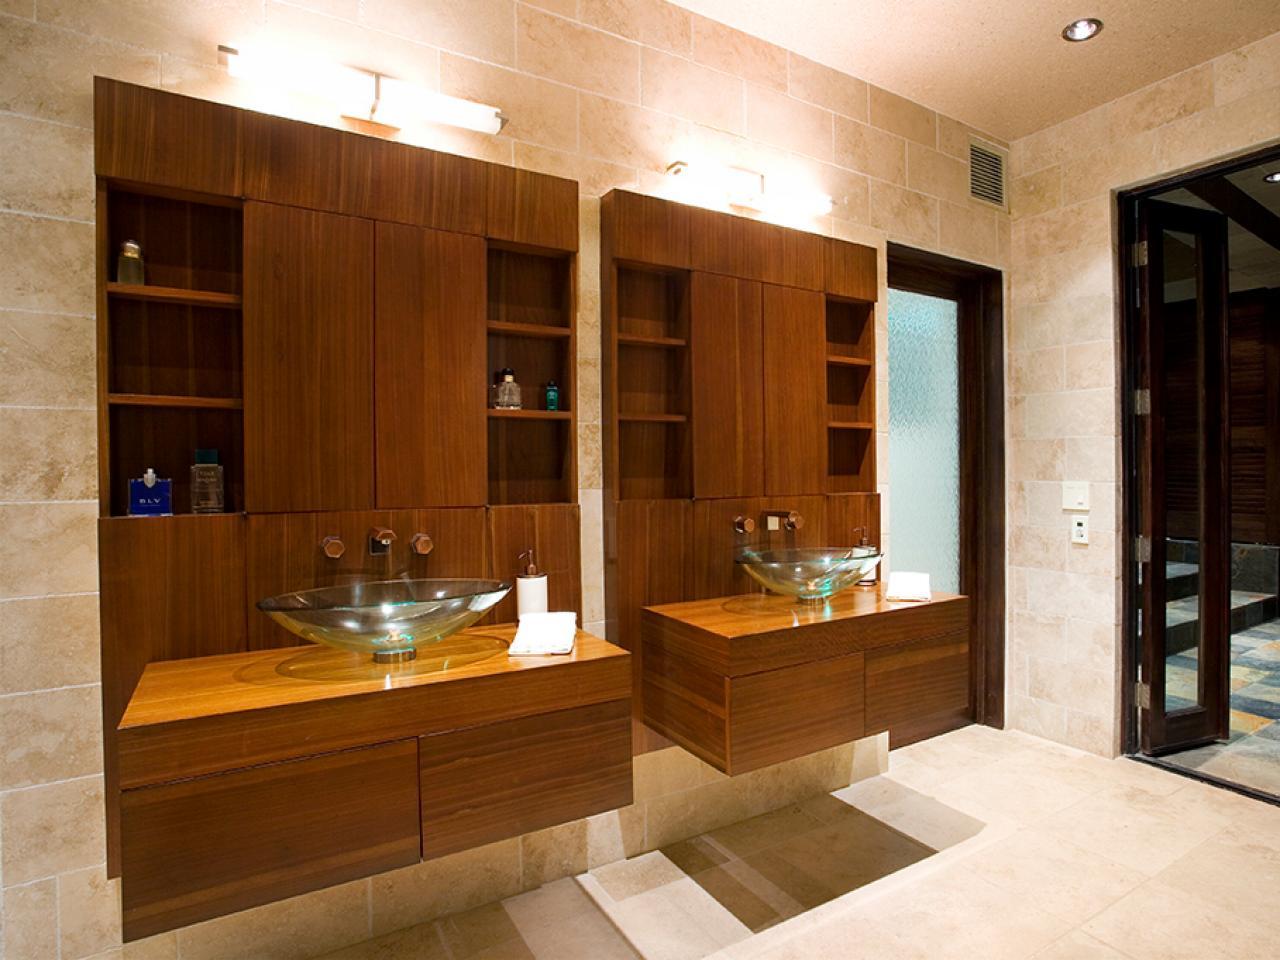 Small Bathroom Cabinets | HGTV